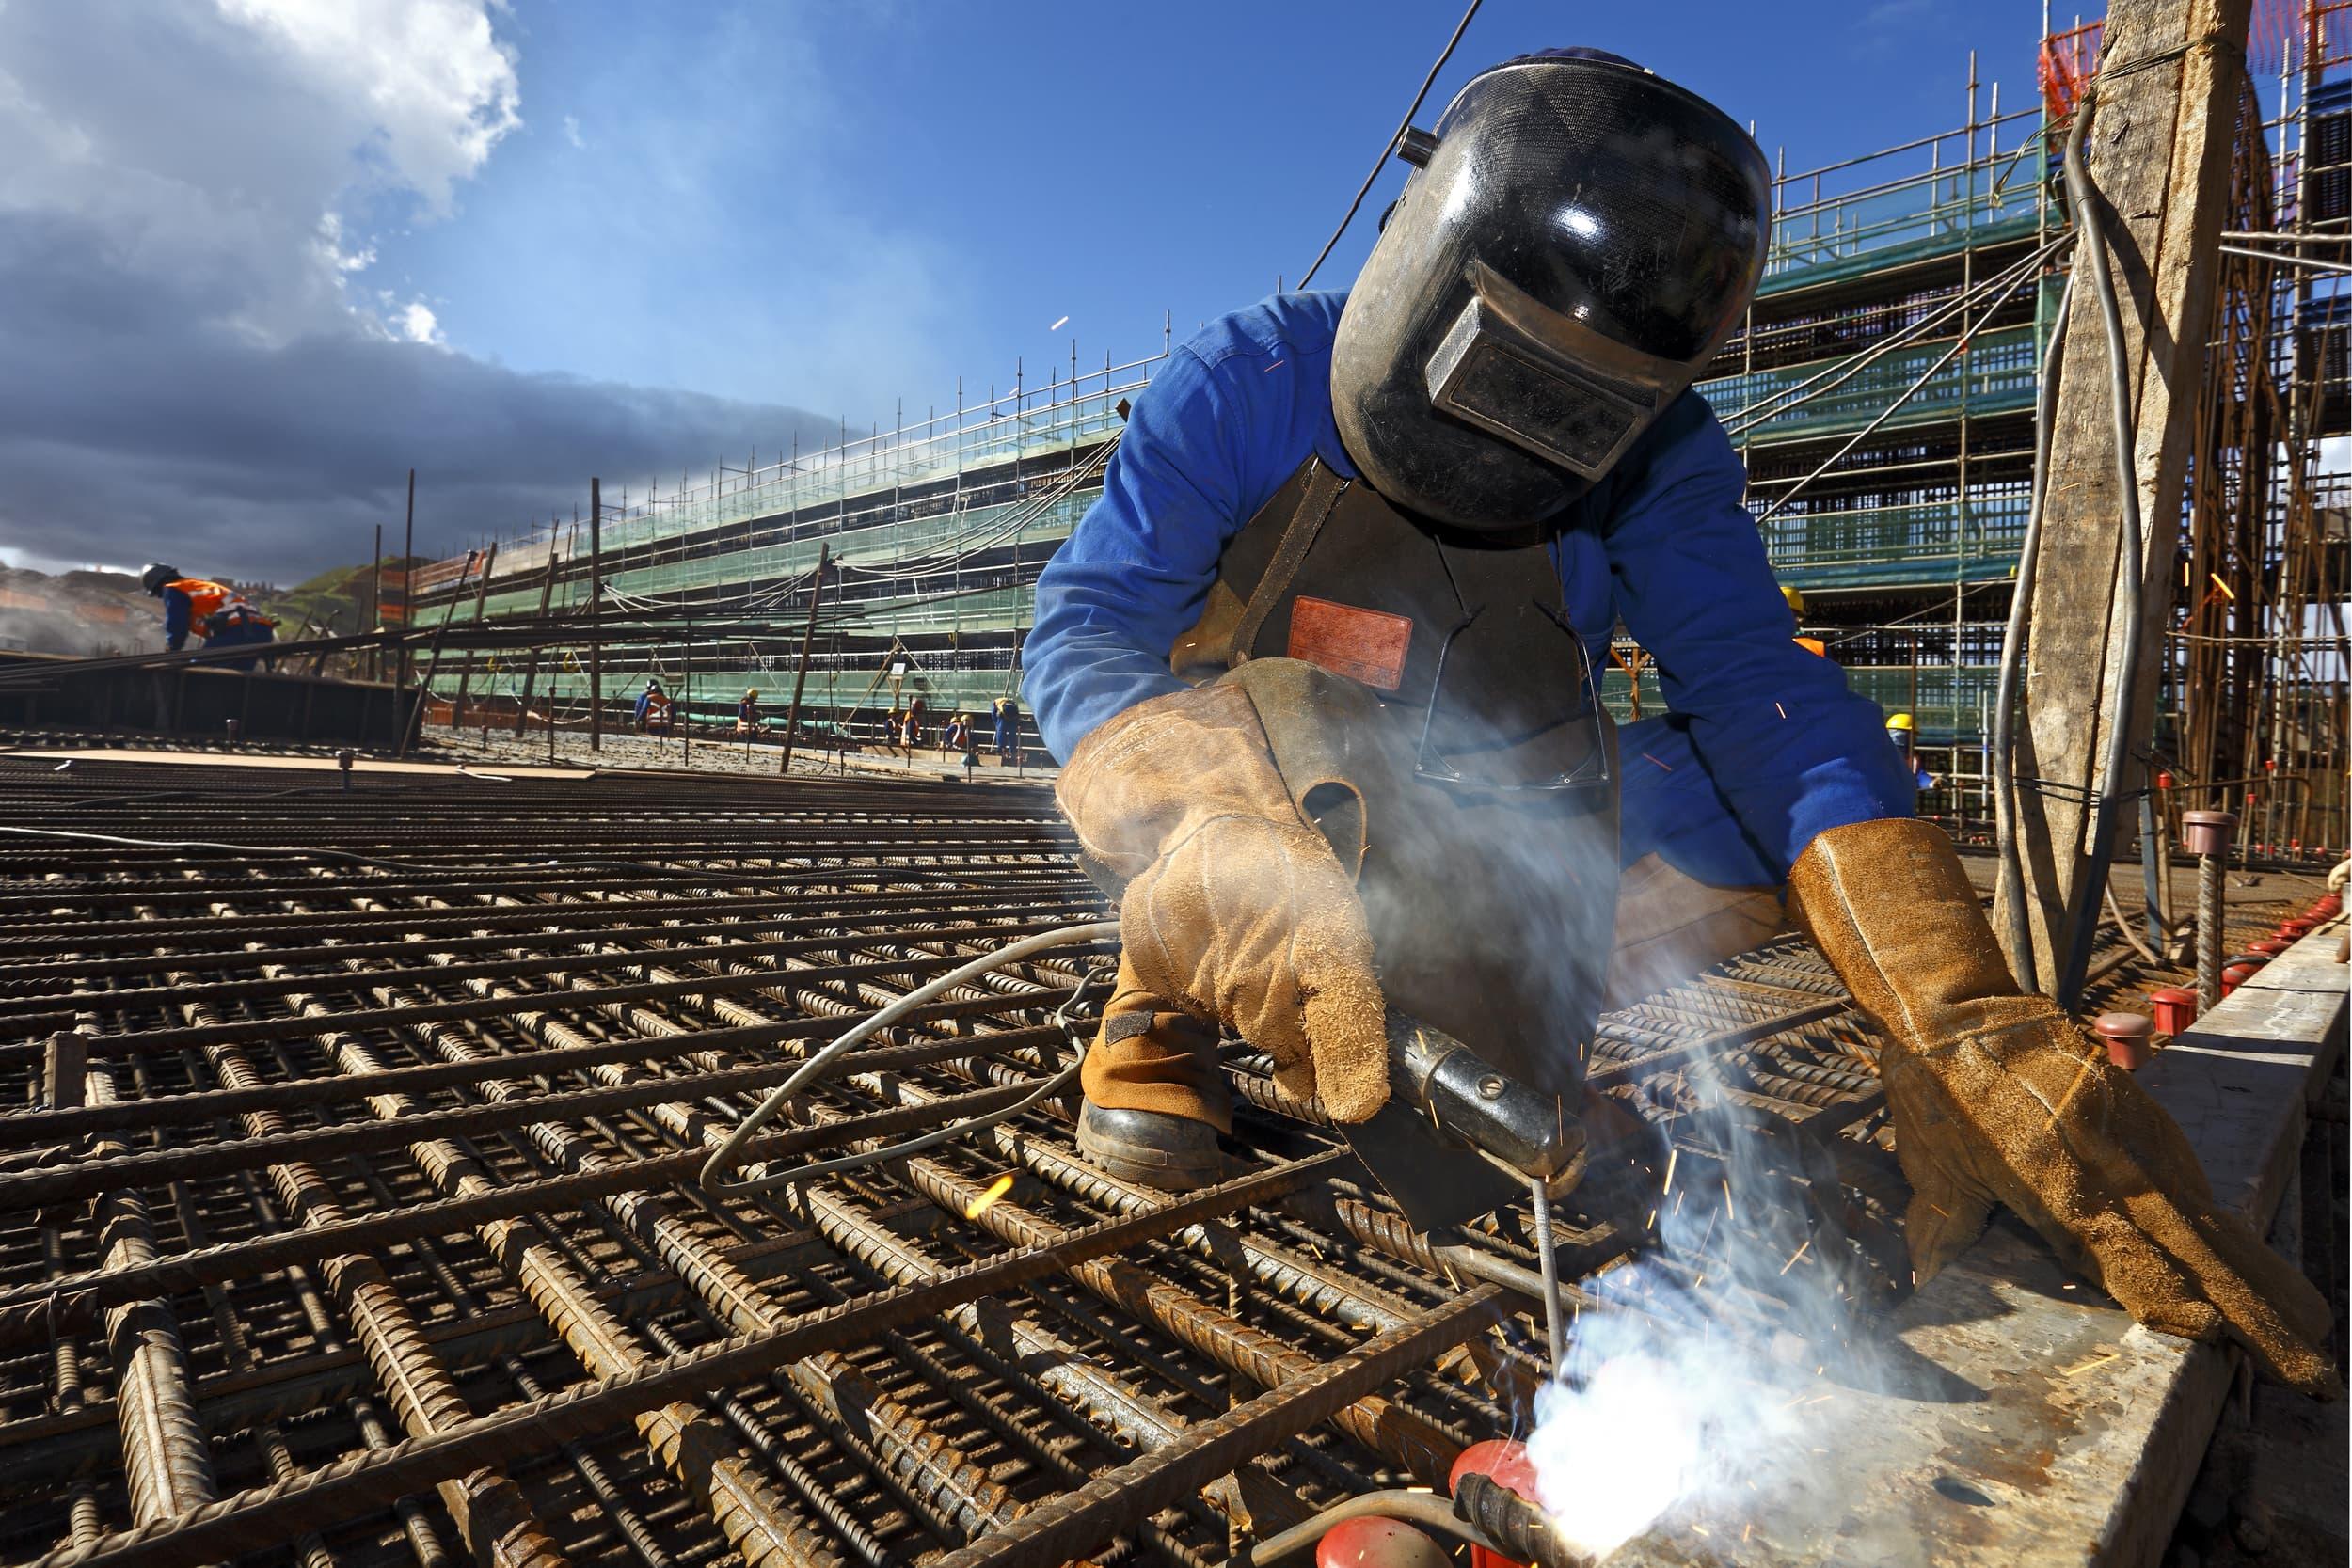 Compliance Training Online Hot Work Construction course